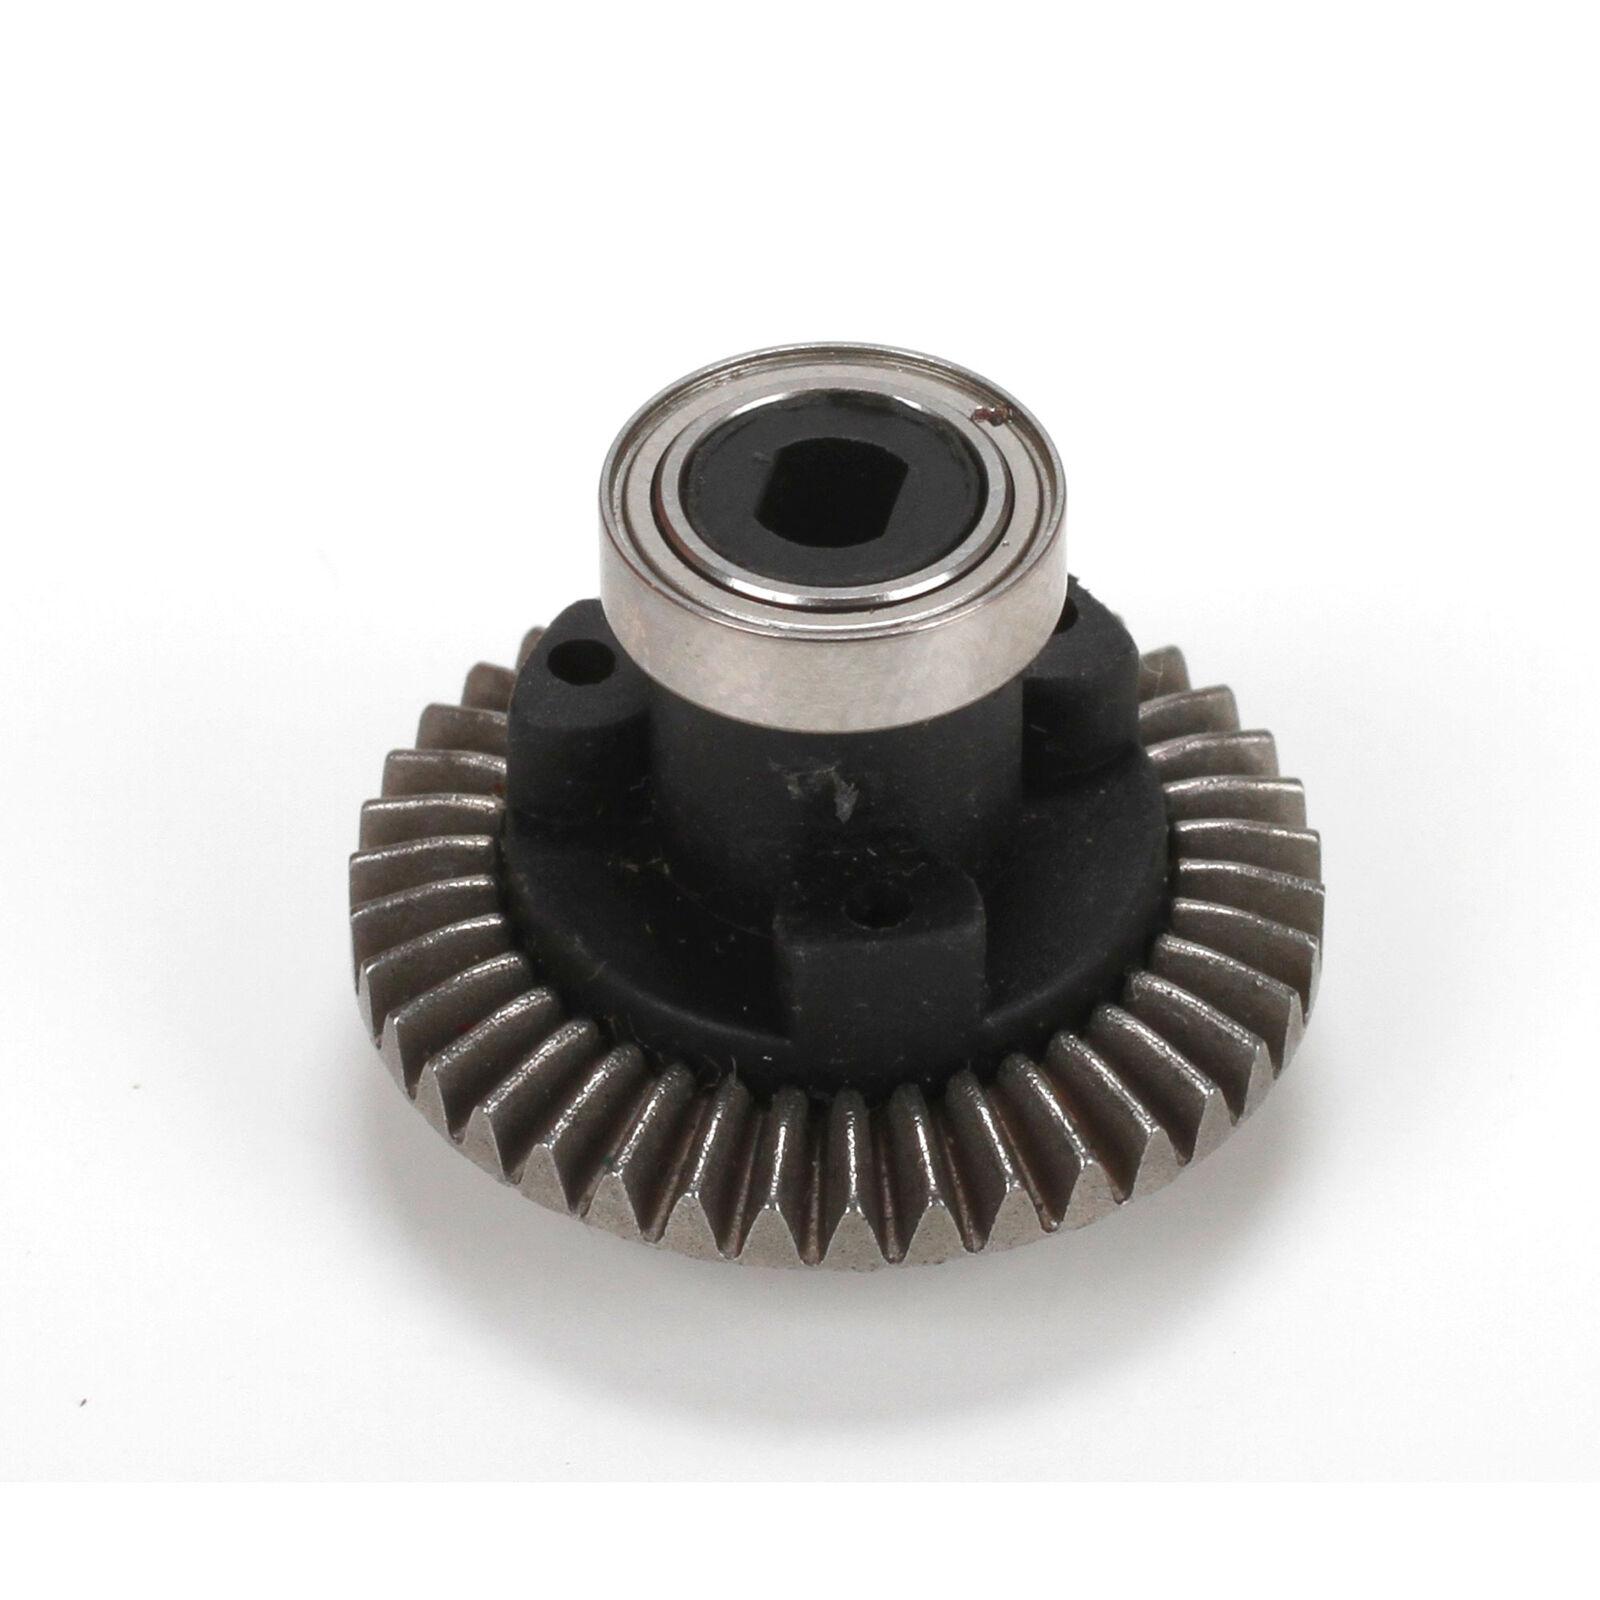 Spool 38T: 1/18 4WD Temper, 1.9 Barrage Kit/RTR, Doomsday, Barrage 2.0